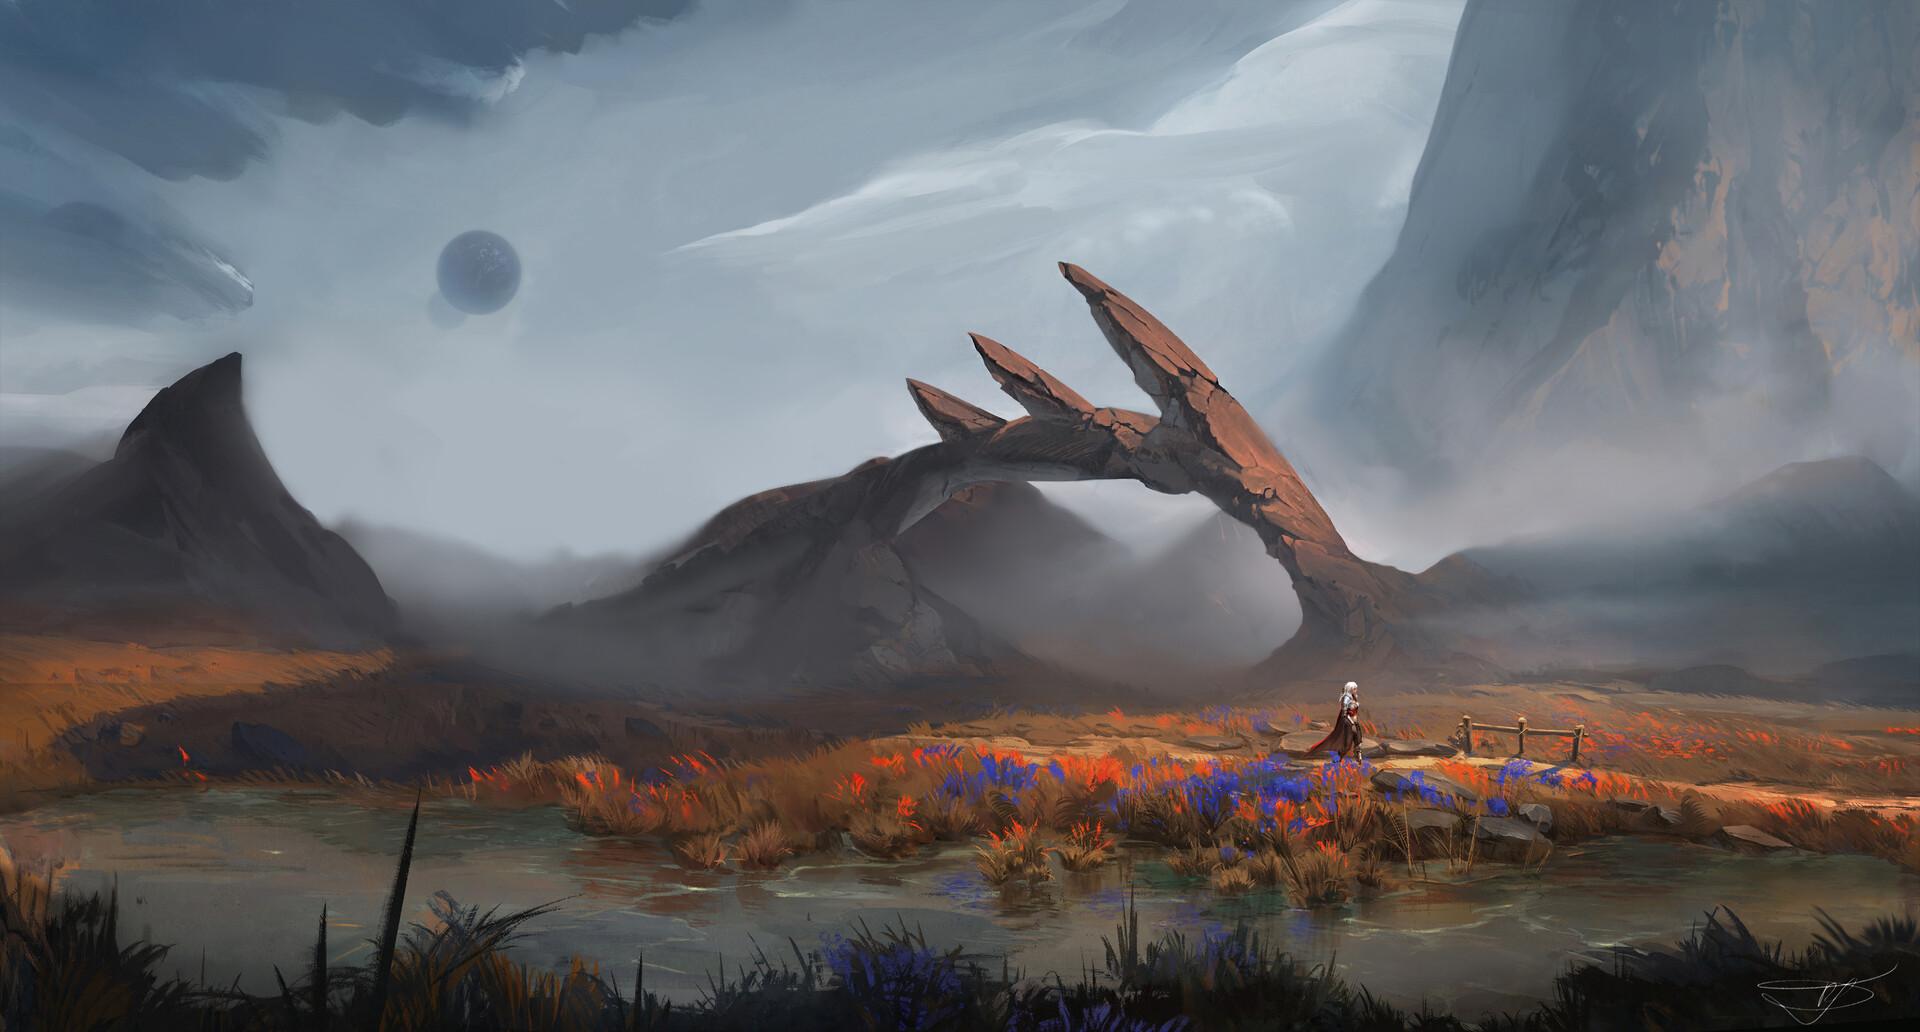 Max Suleimanov Digital Art Landscape Valley River Mist Rock Formation Clouds 1920x1032